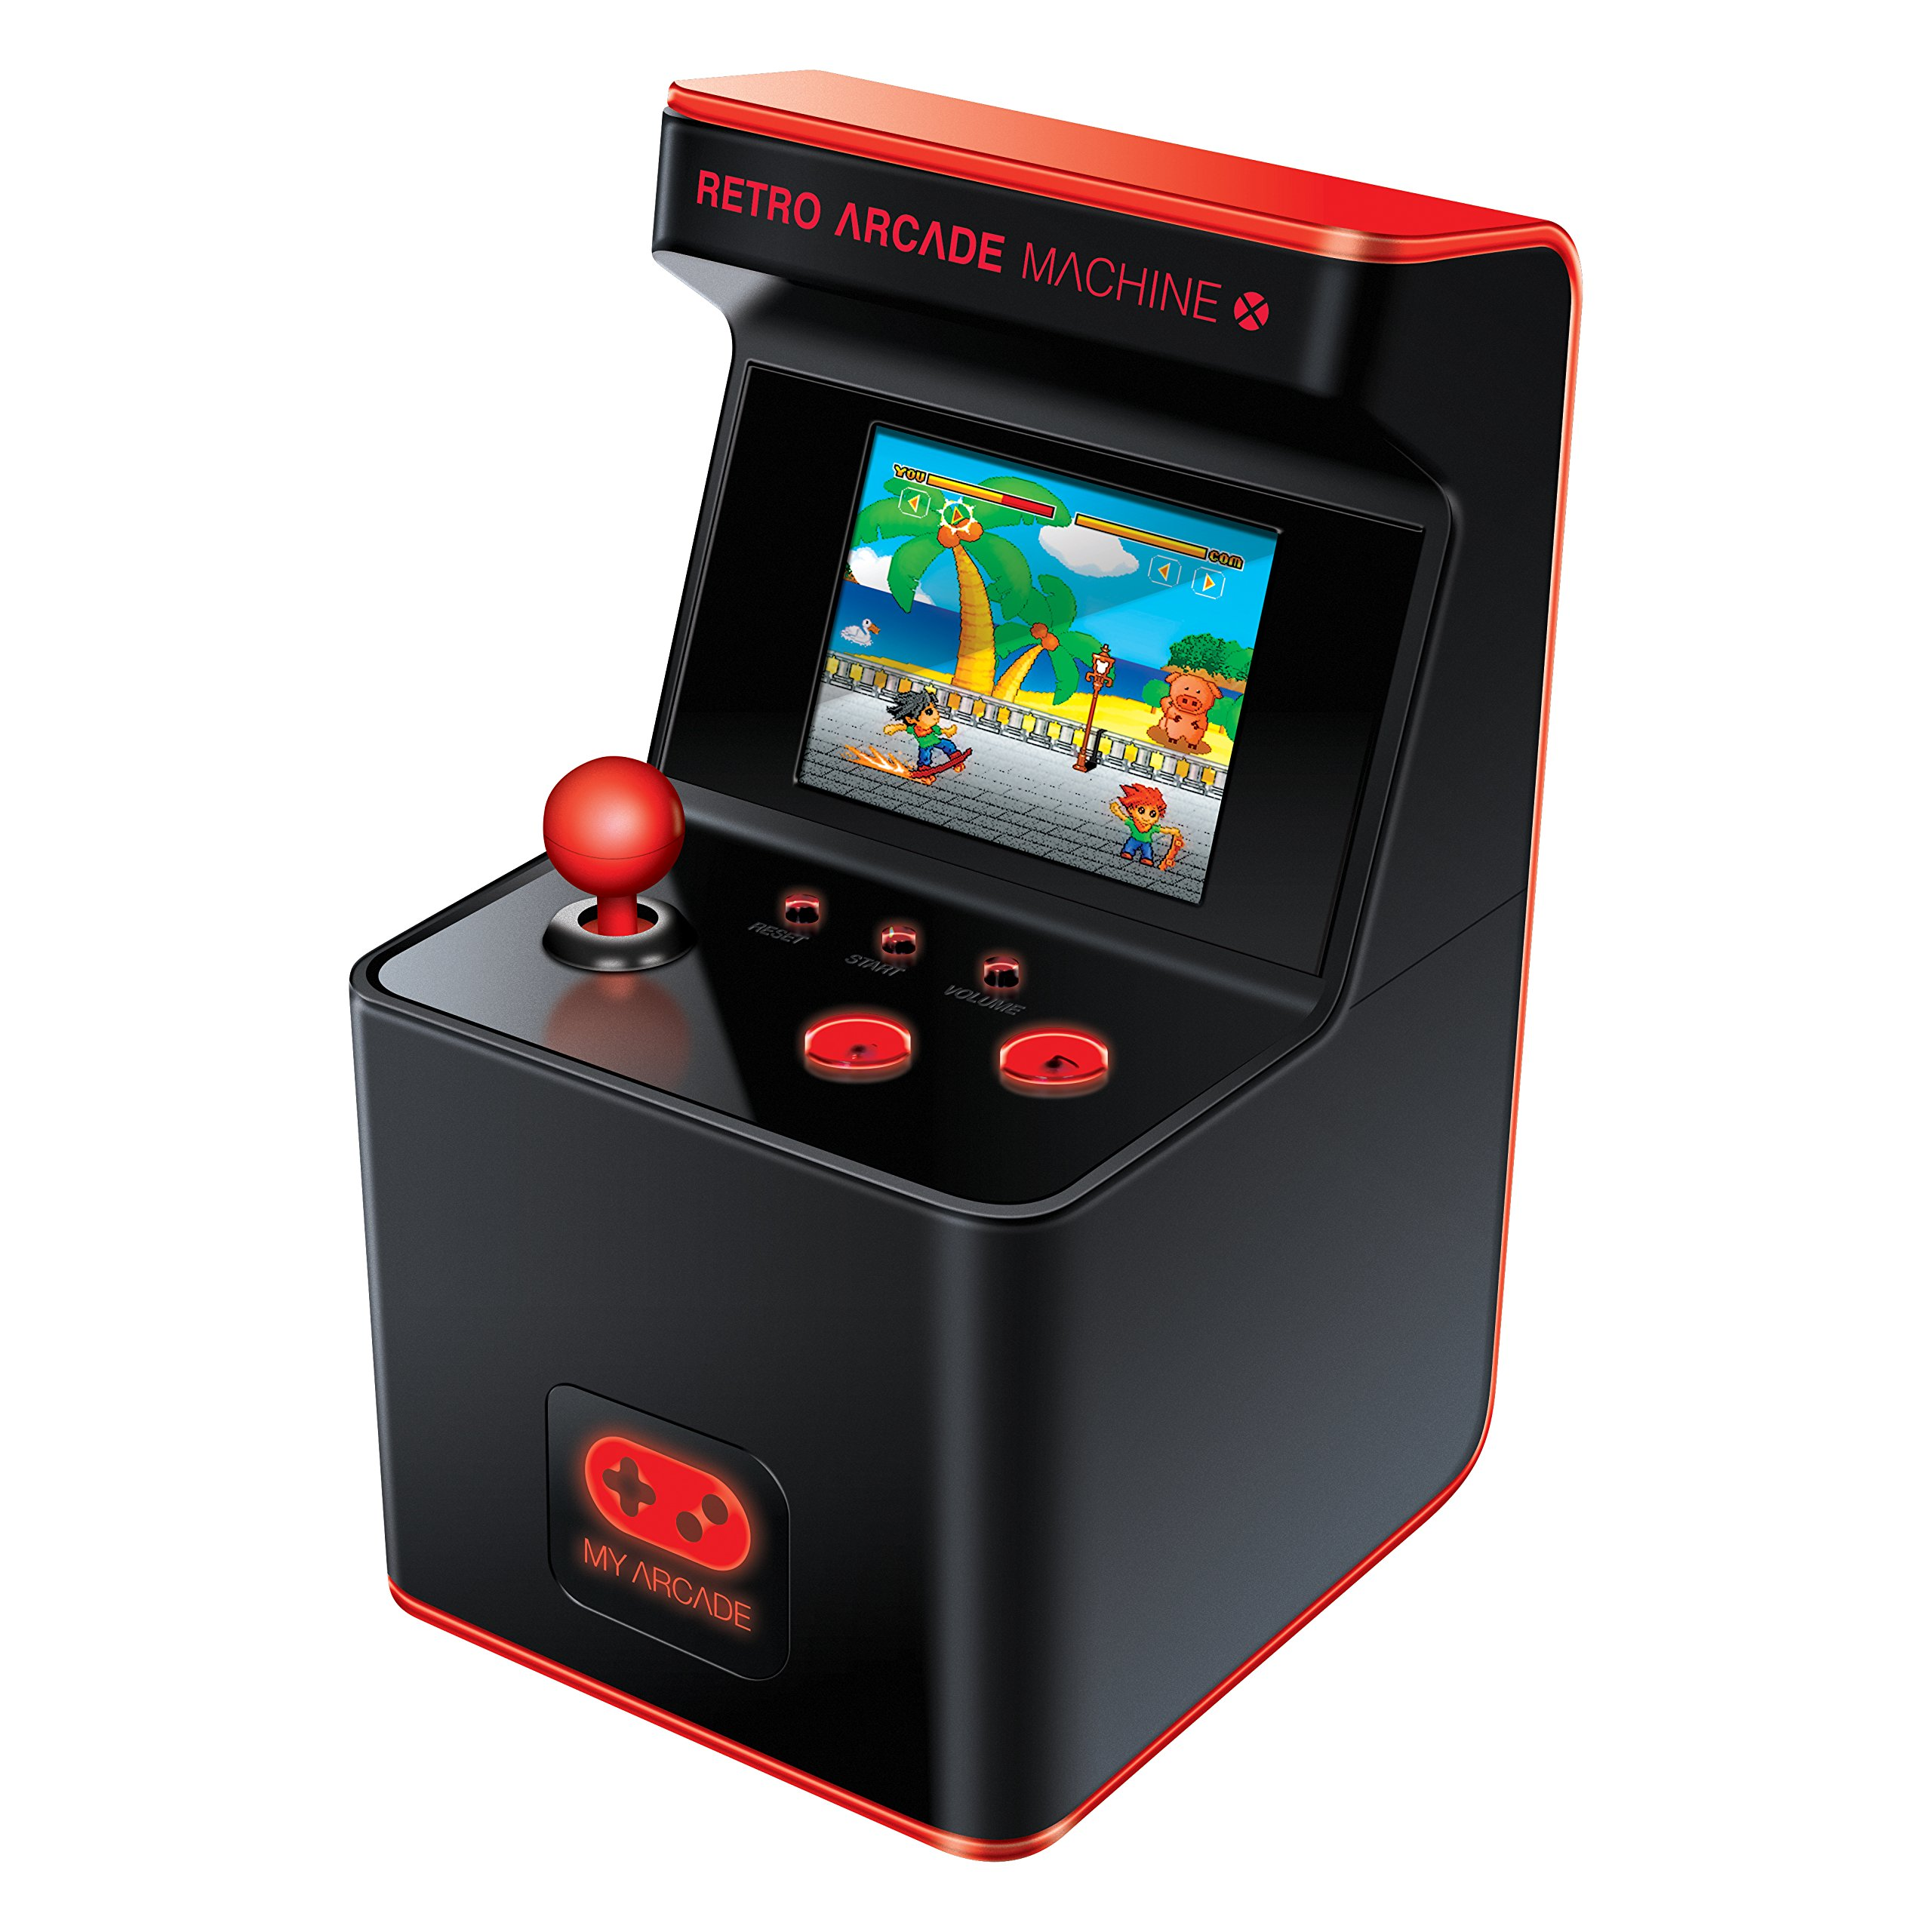 My Arcade - Retro Arcade Machine X Portable Gaming Mini Arcade Cabinet with 300 Built-in Hi-res 16 bit Games by My Arcade